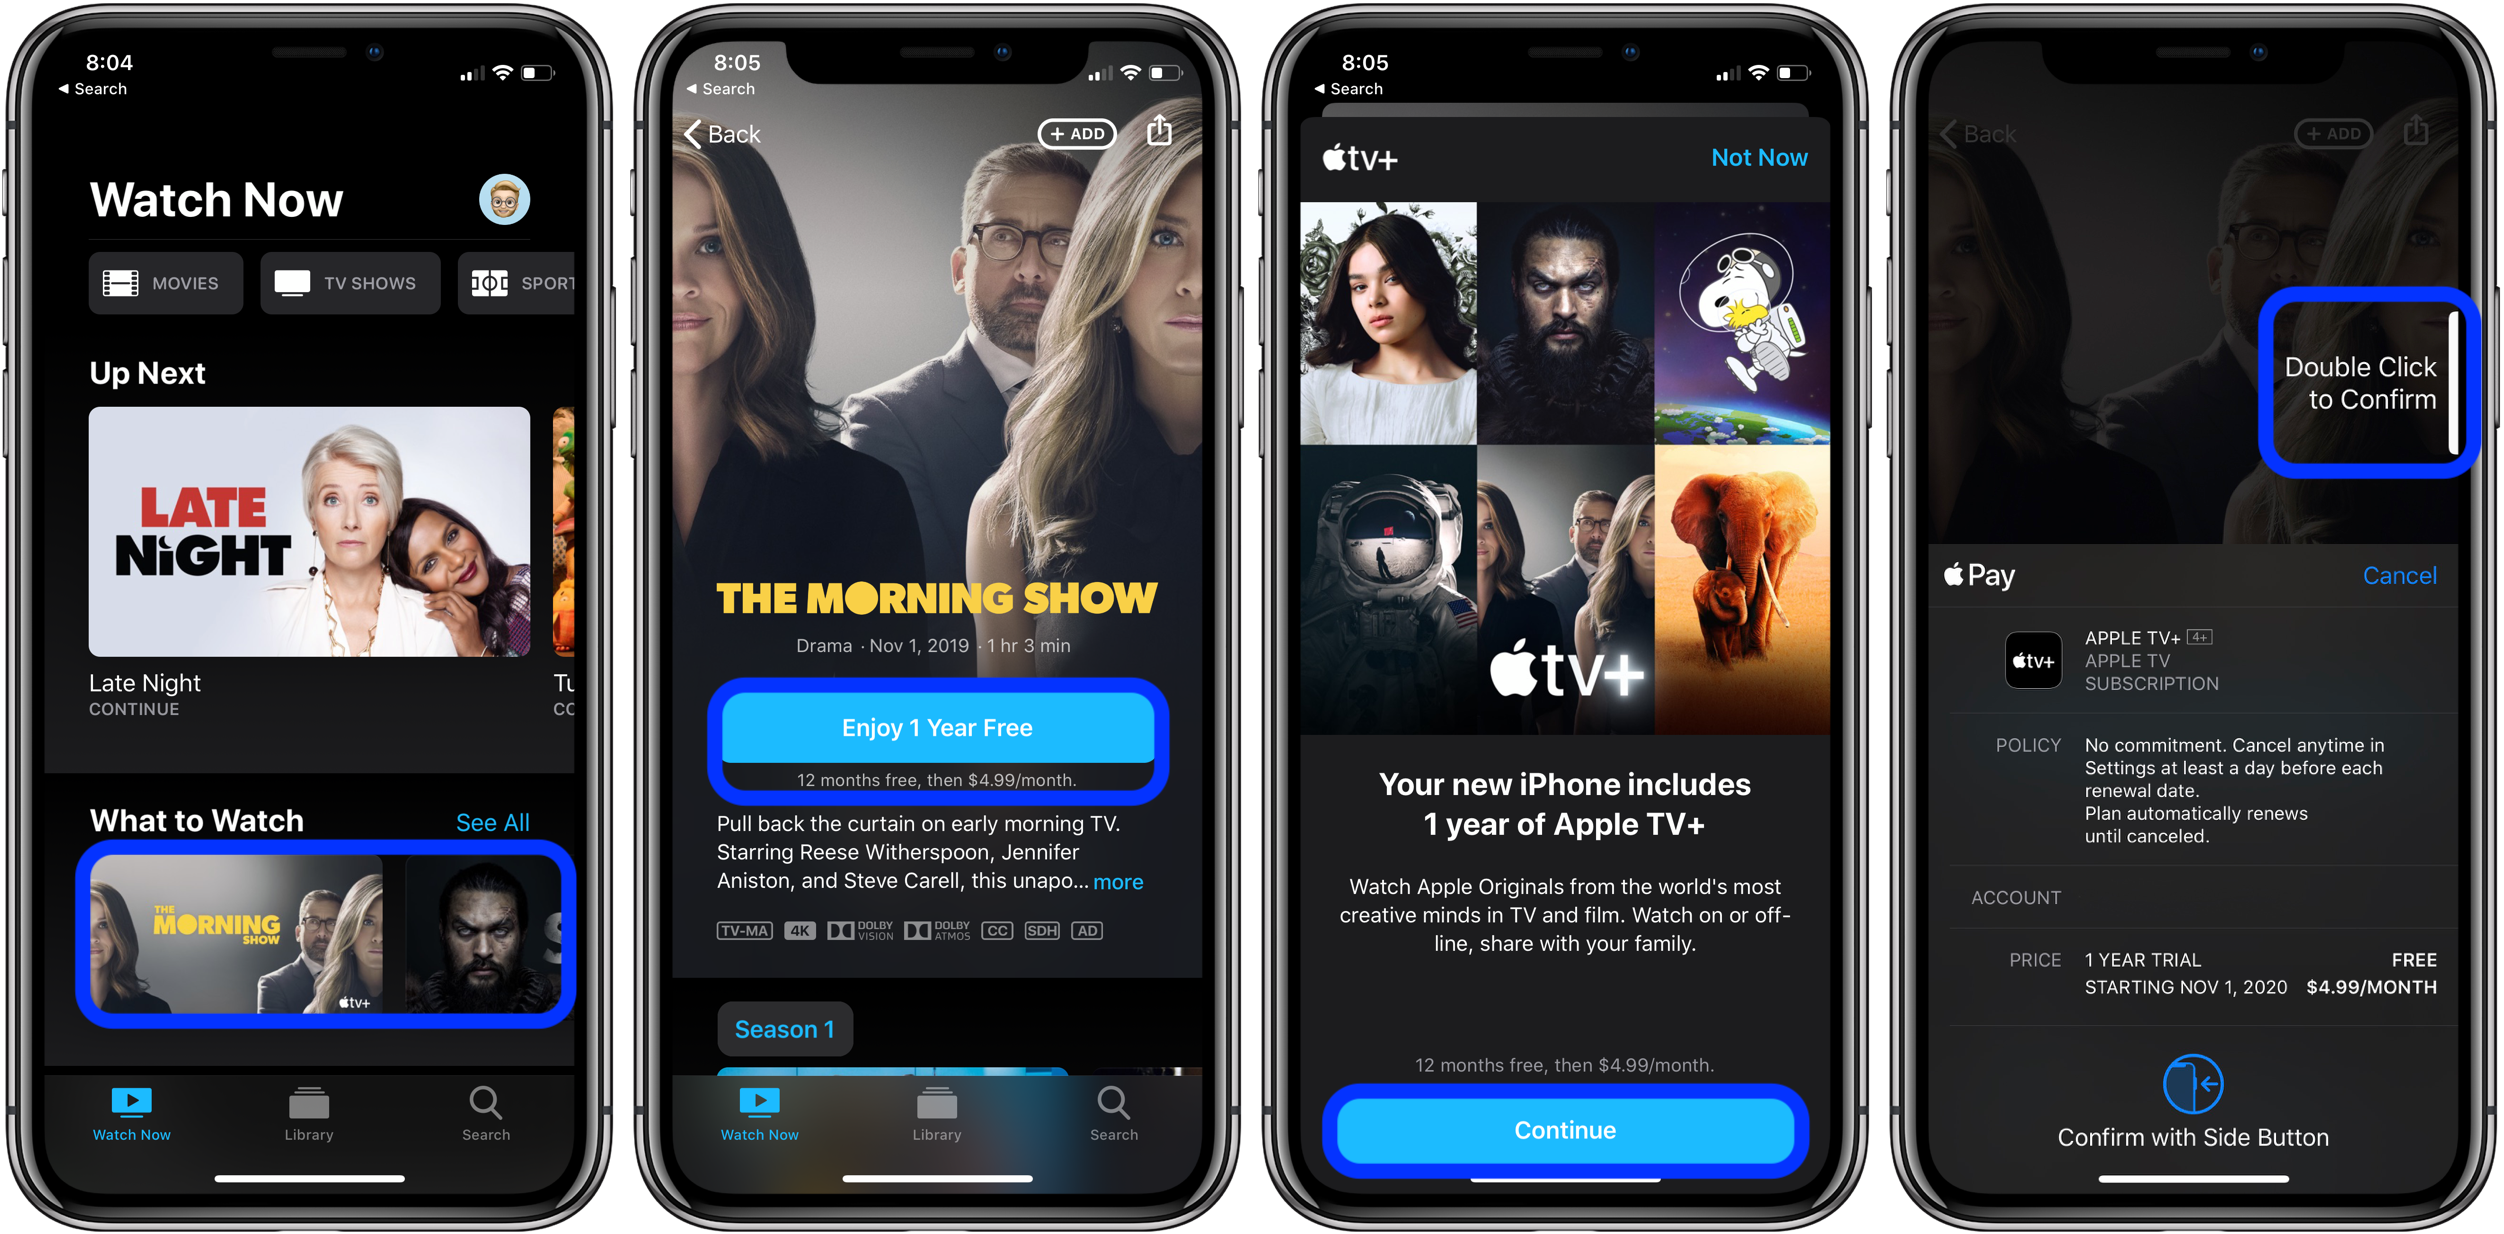 How to get free year Apple TV+ walkthrough 1